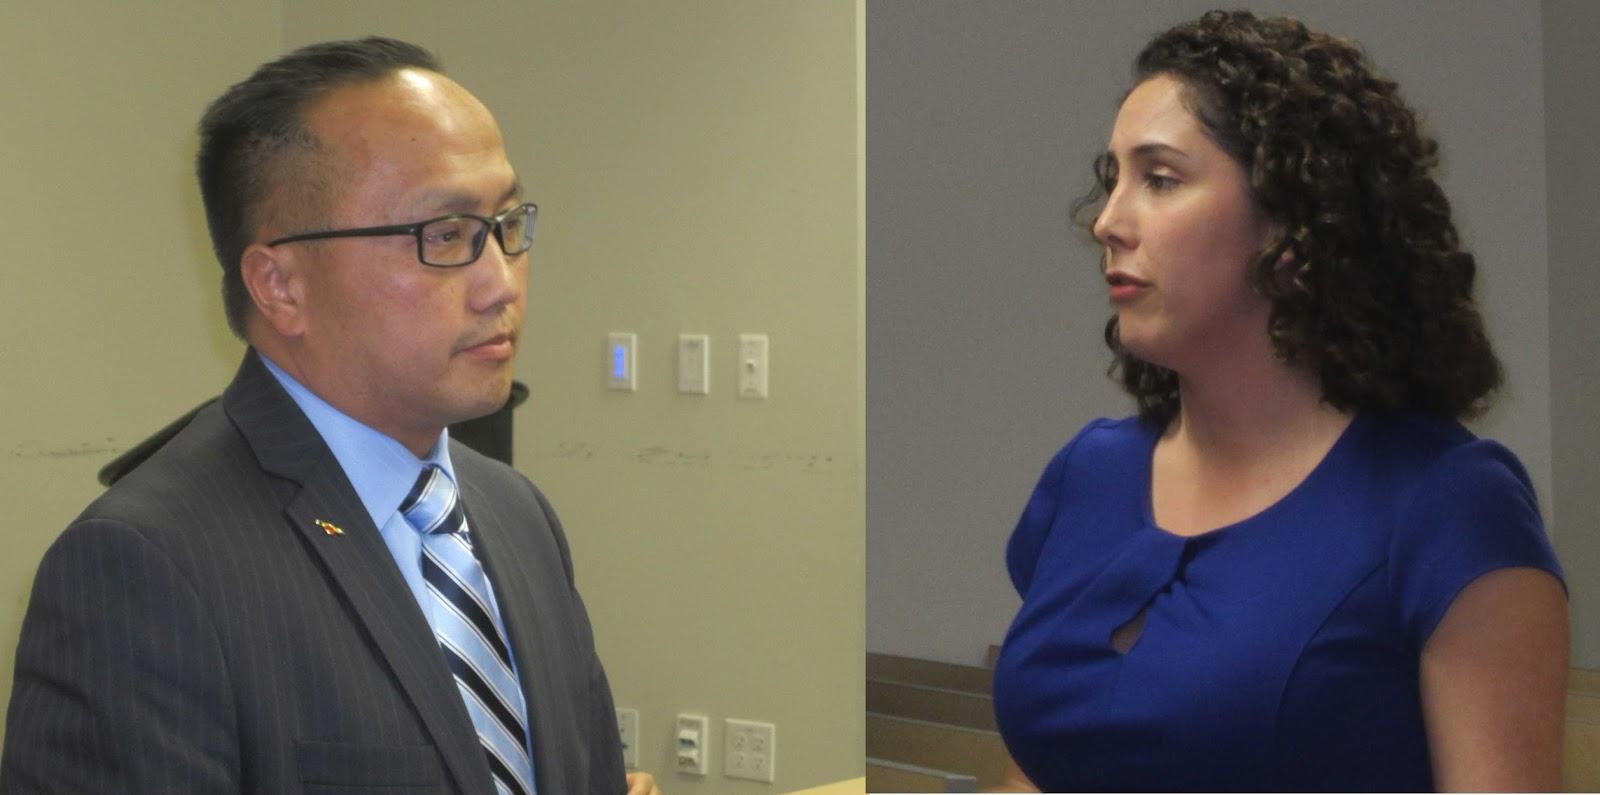 Chaires, Ly Announce Labor Endorsements in Elk Grove City Council Race